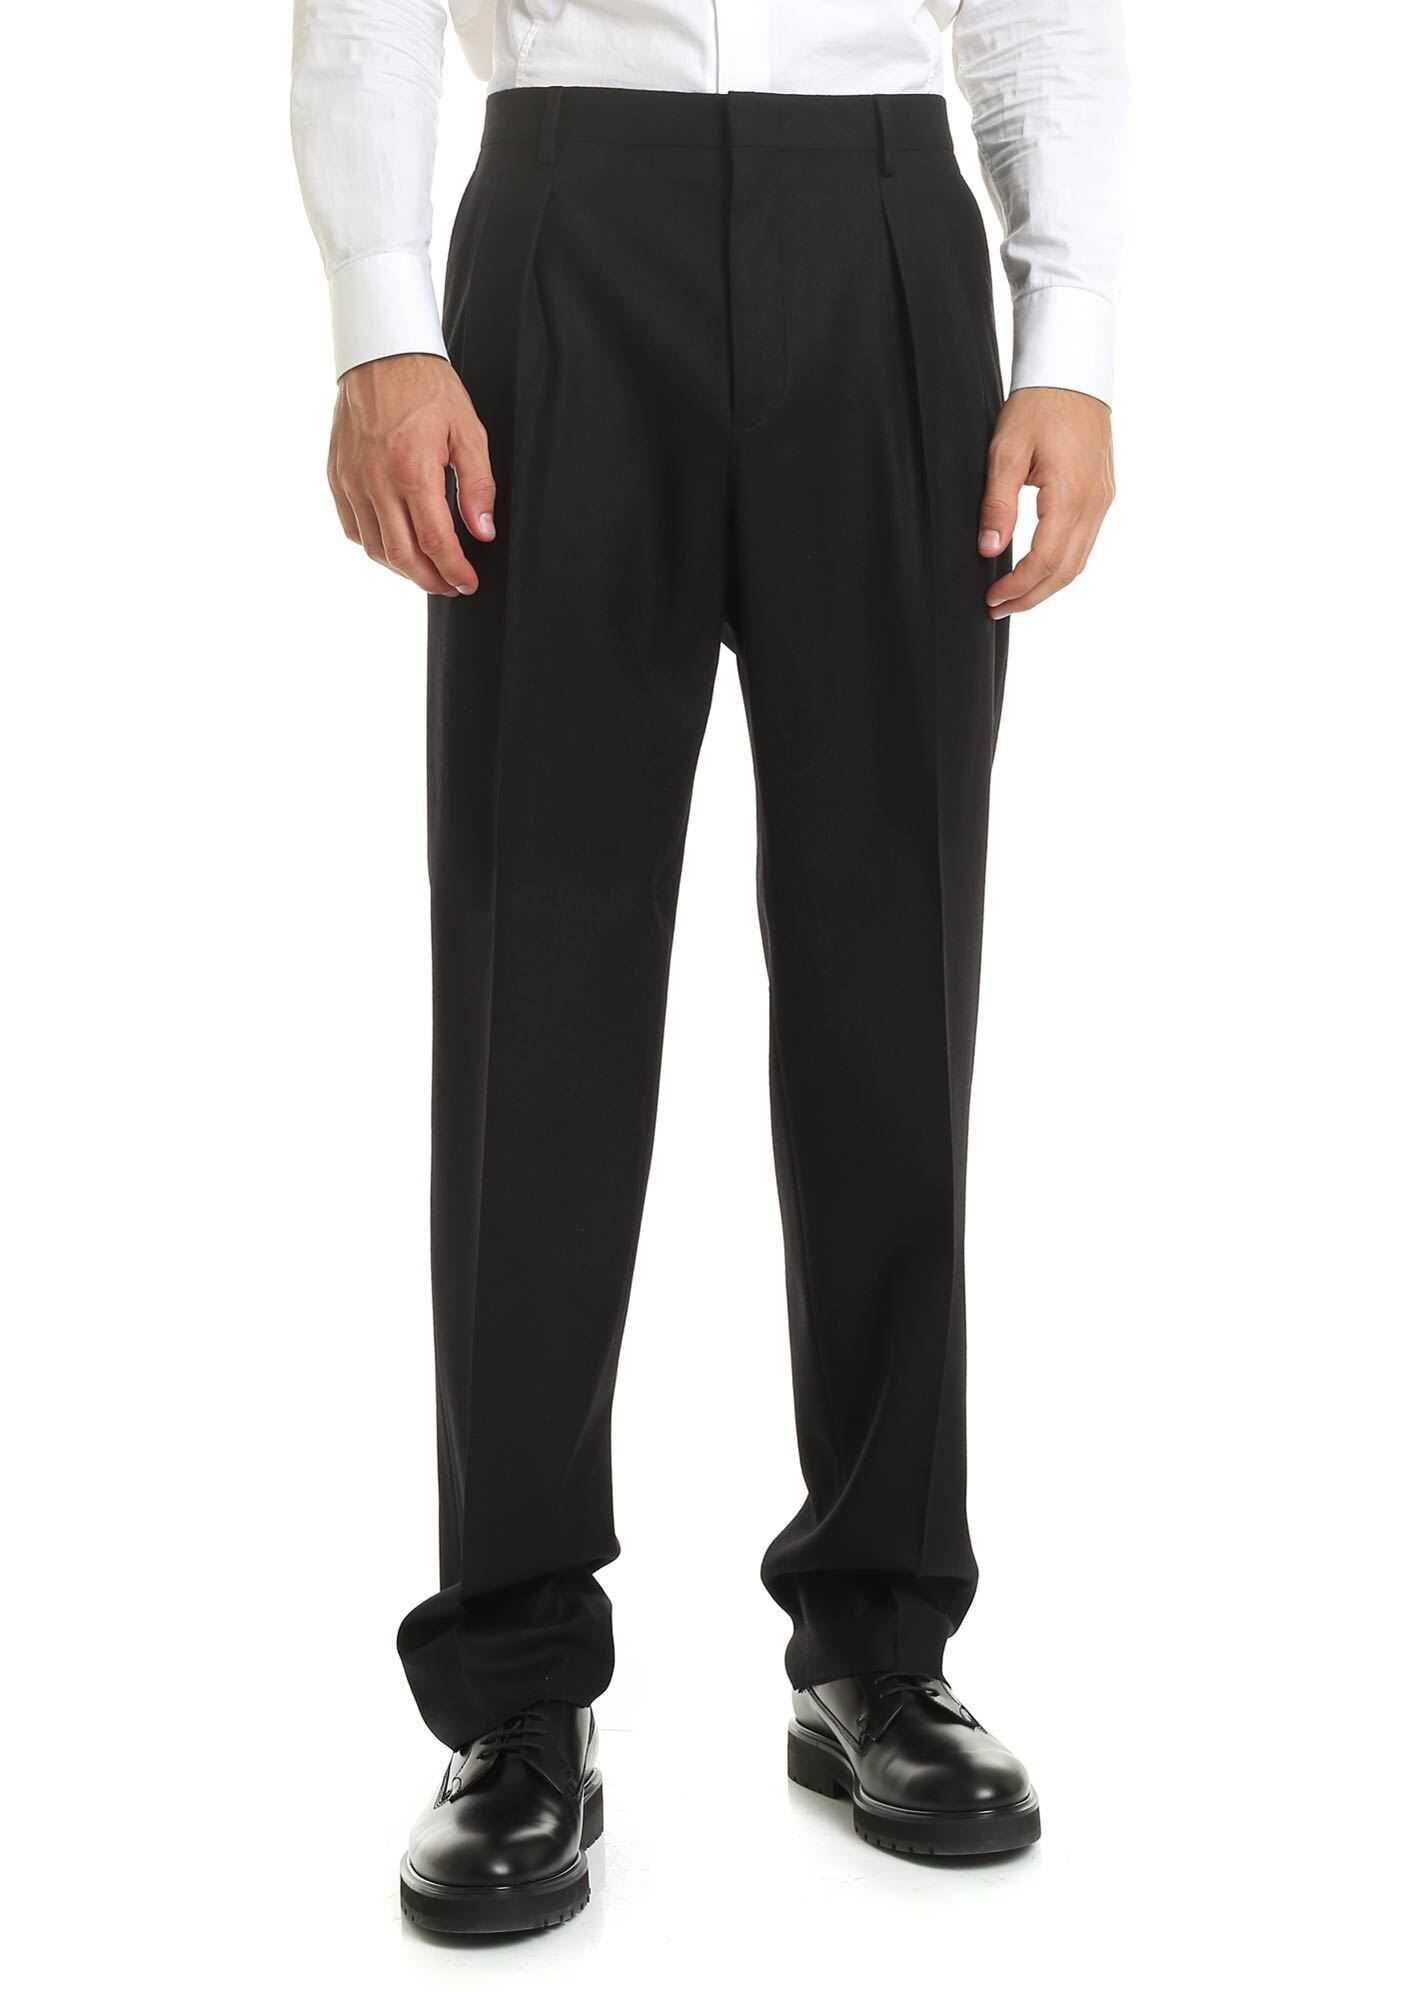 Valentino Garavani Virgin Wool Trousers In Black Black imagine